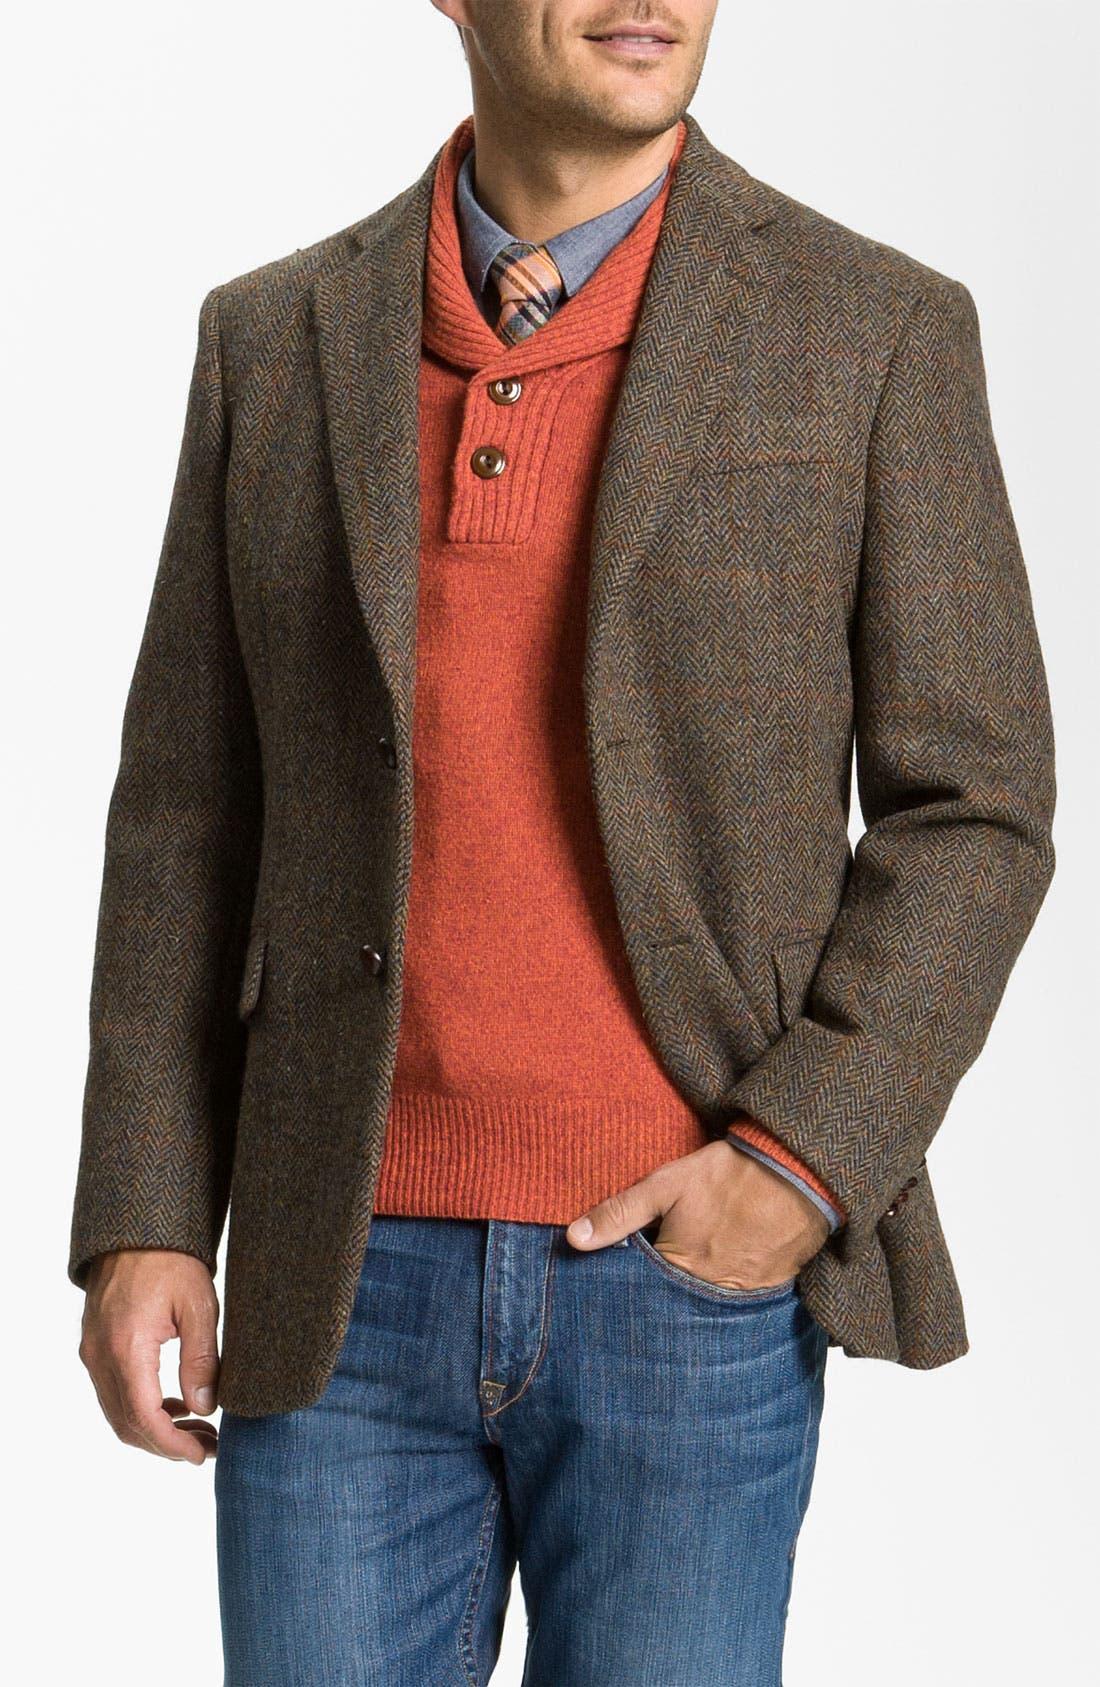 Main Image - John W. Nordstrom® Herringbone Sportcoat